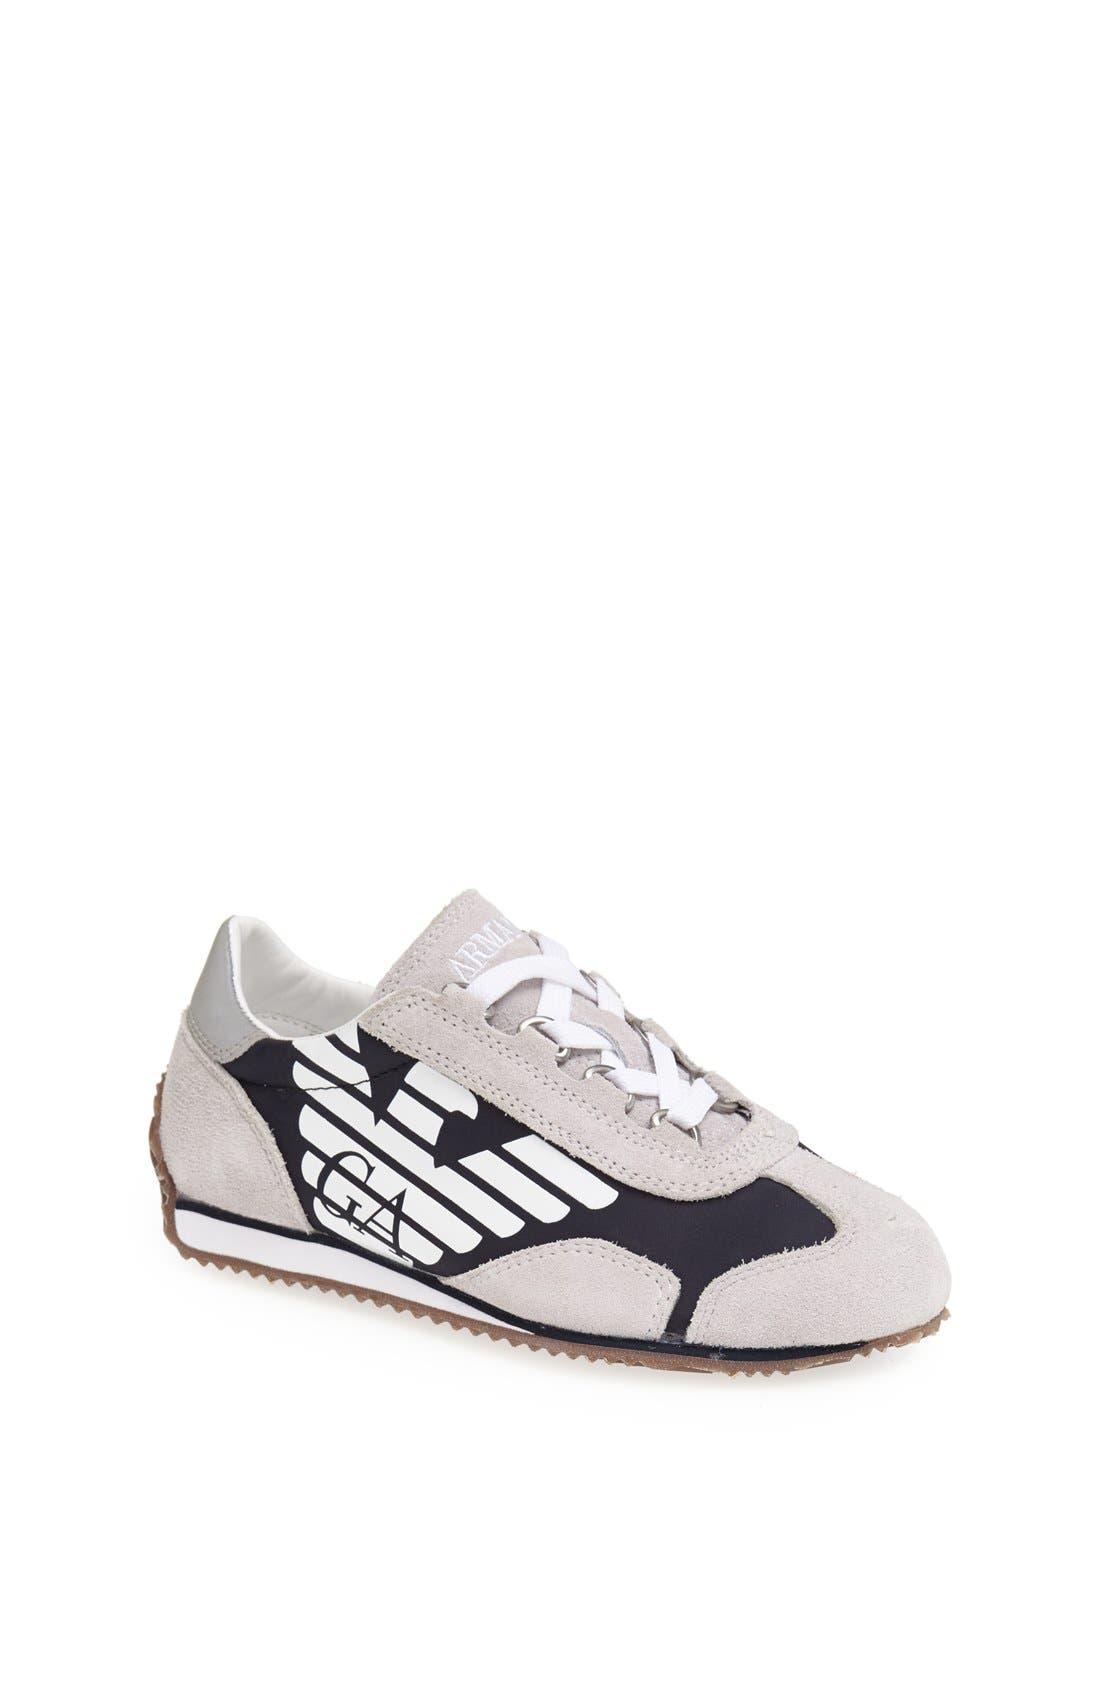 Main Image - Armani Junior Sneaker (Toddler, Little Kid & Big Kid)